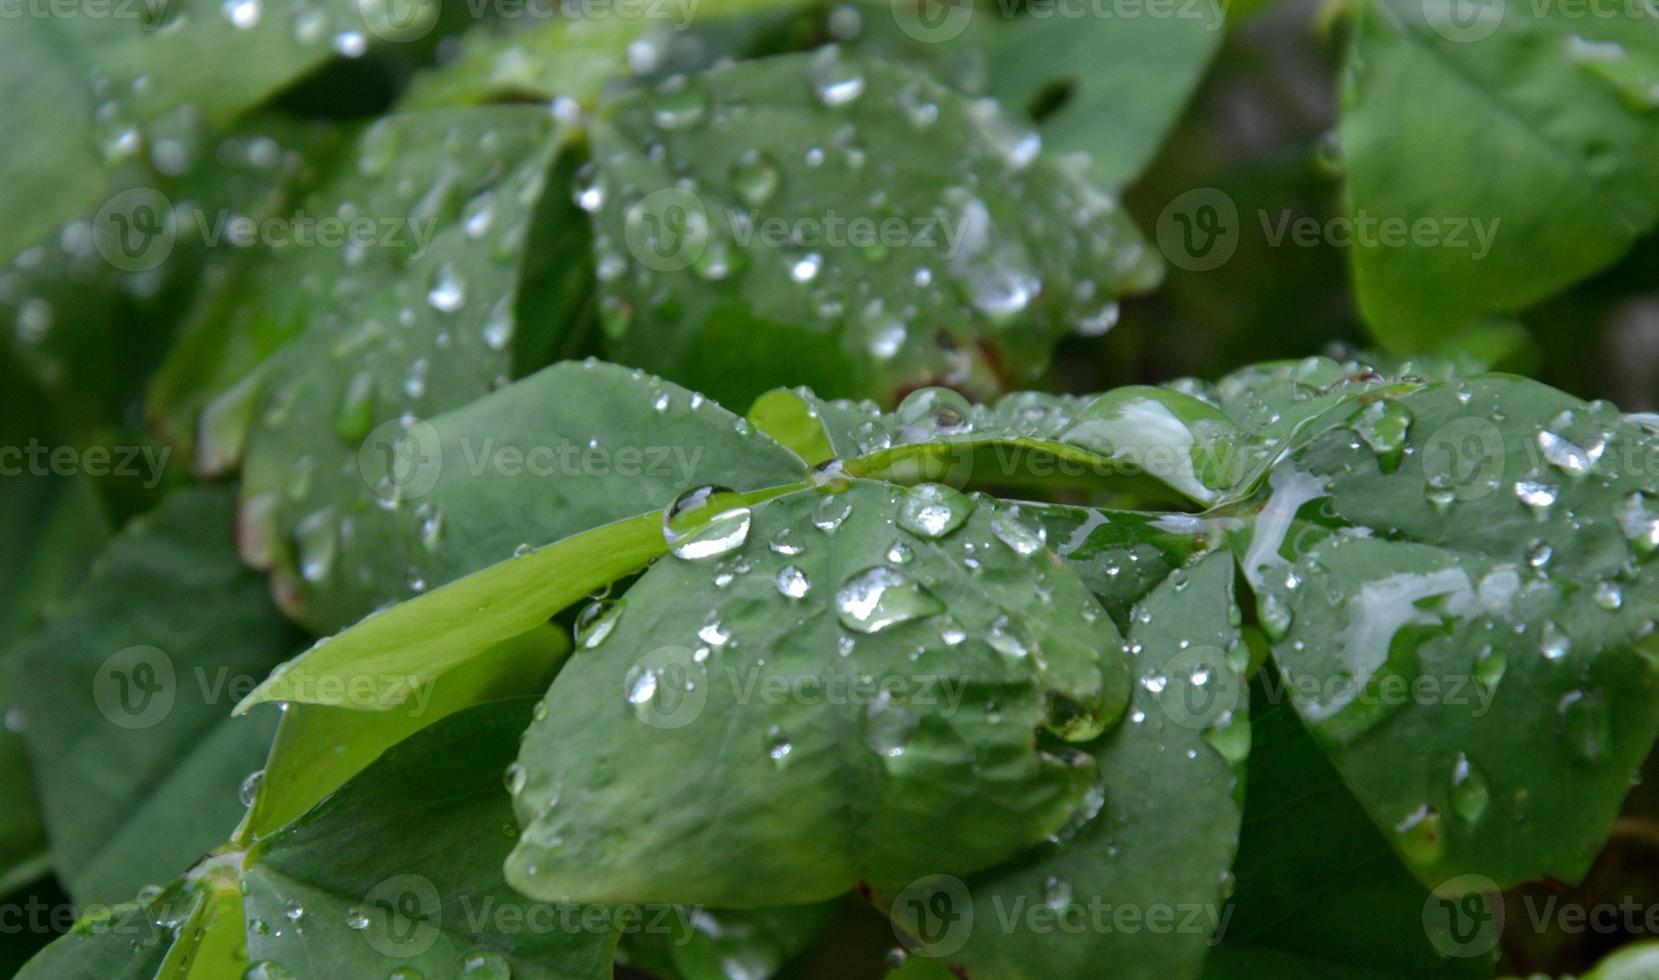 helder water druppels op klaver plant foto